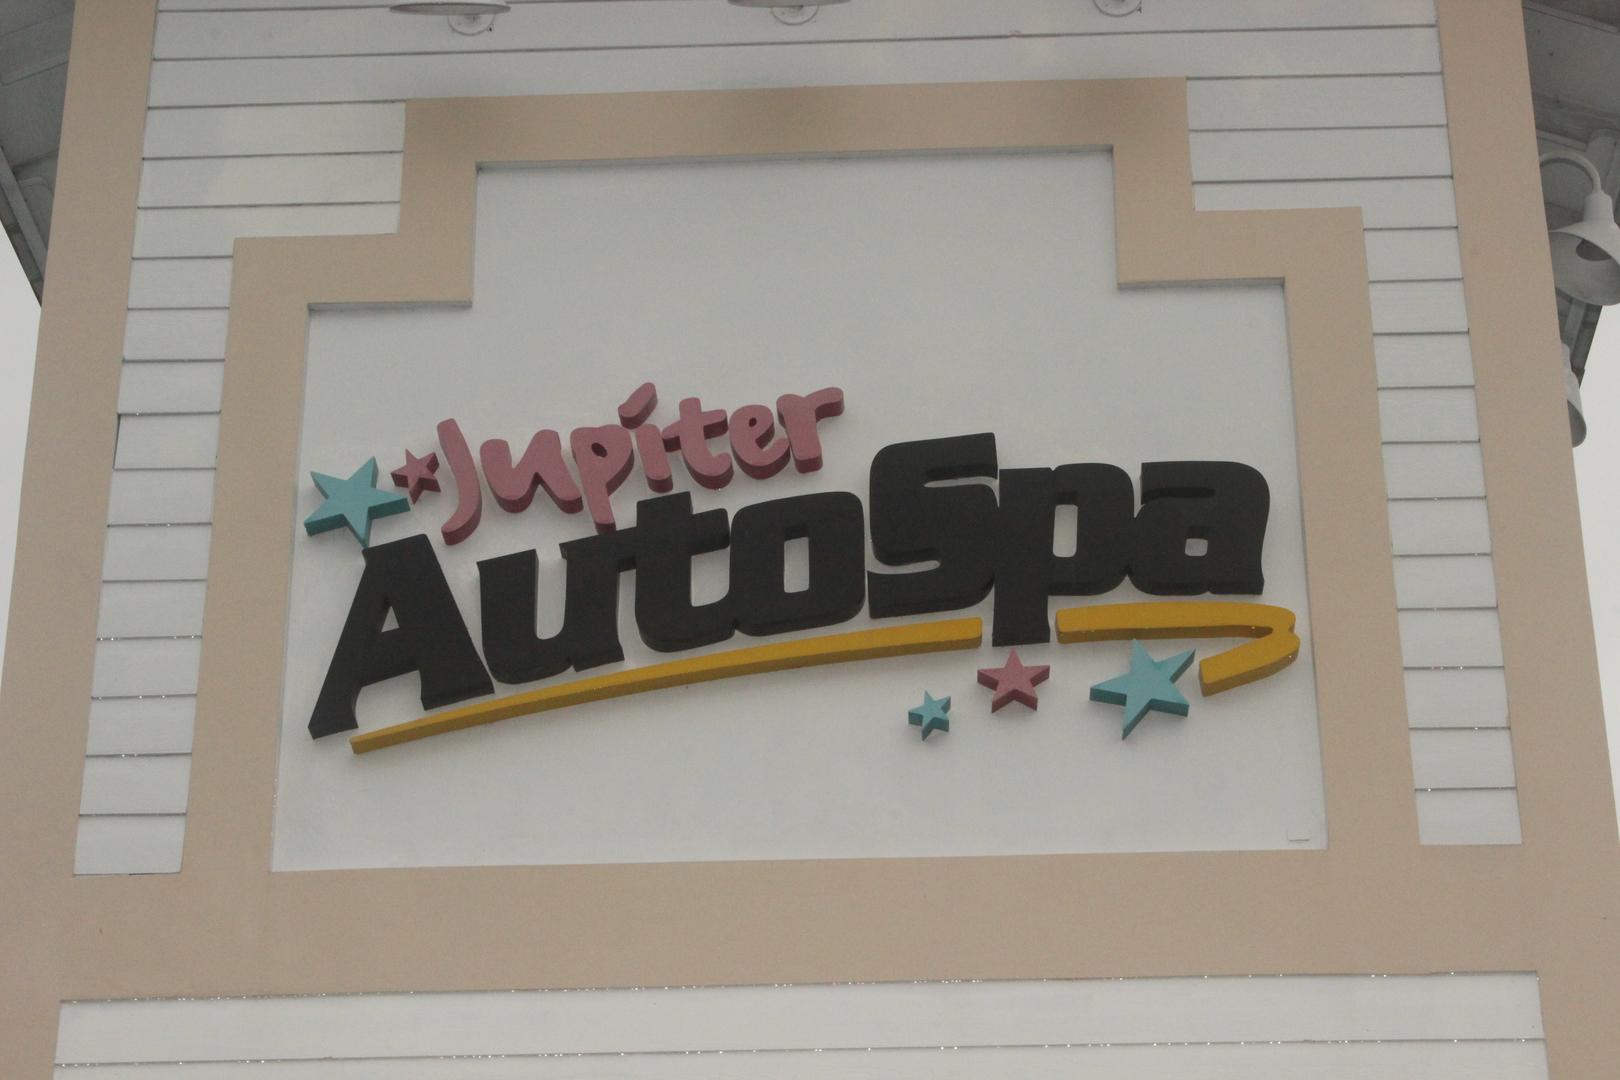 Jupiter auto spa and lube center in jupiter, fl